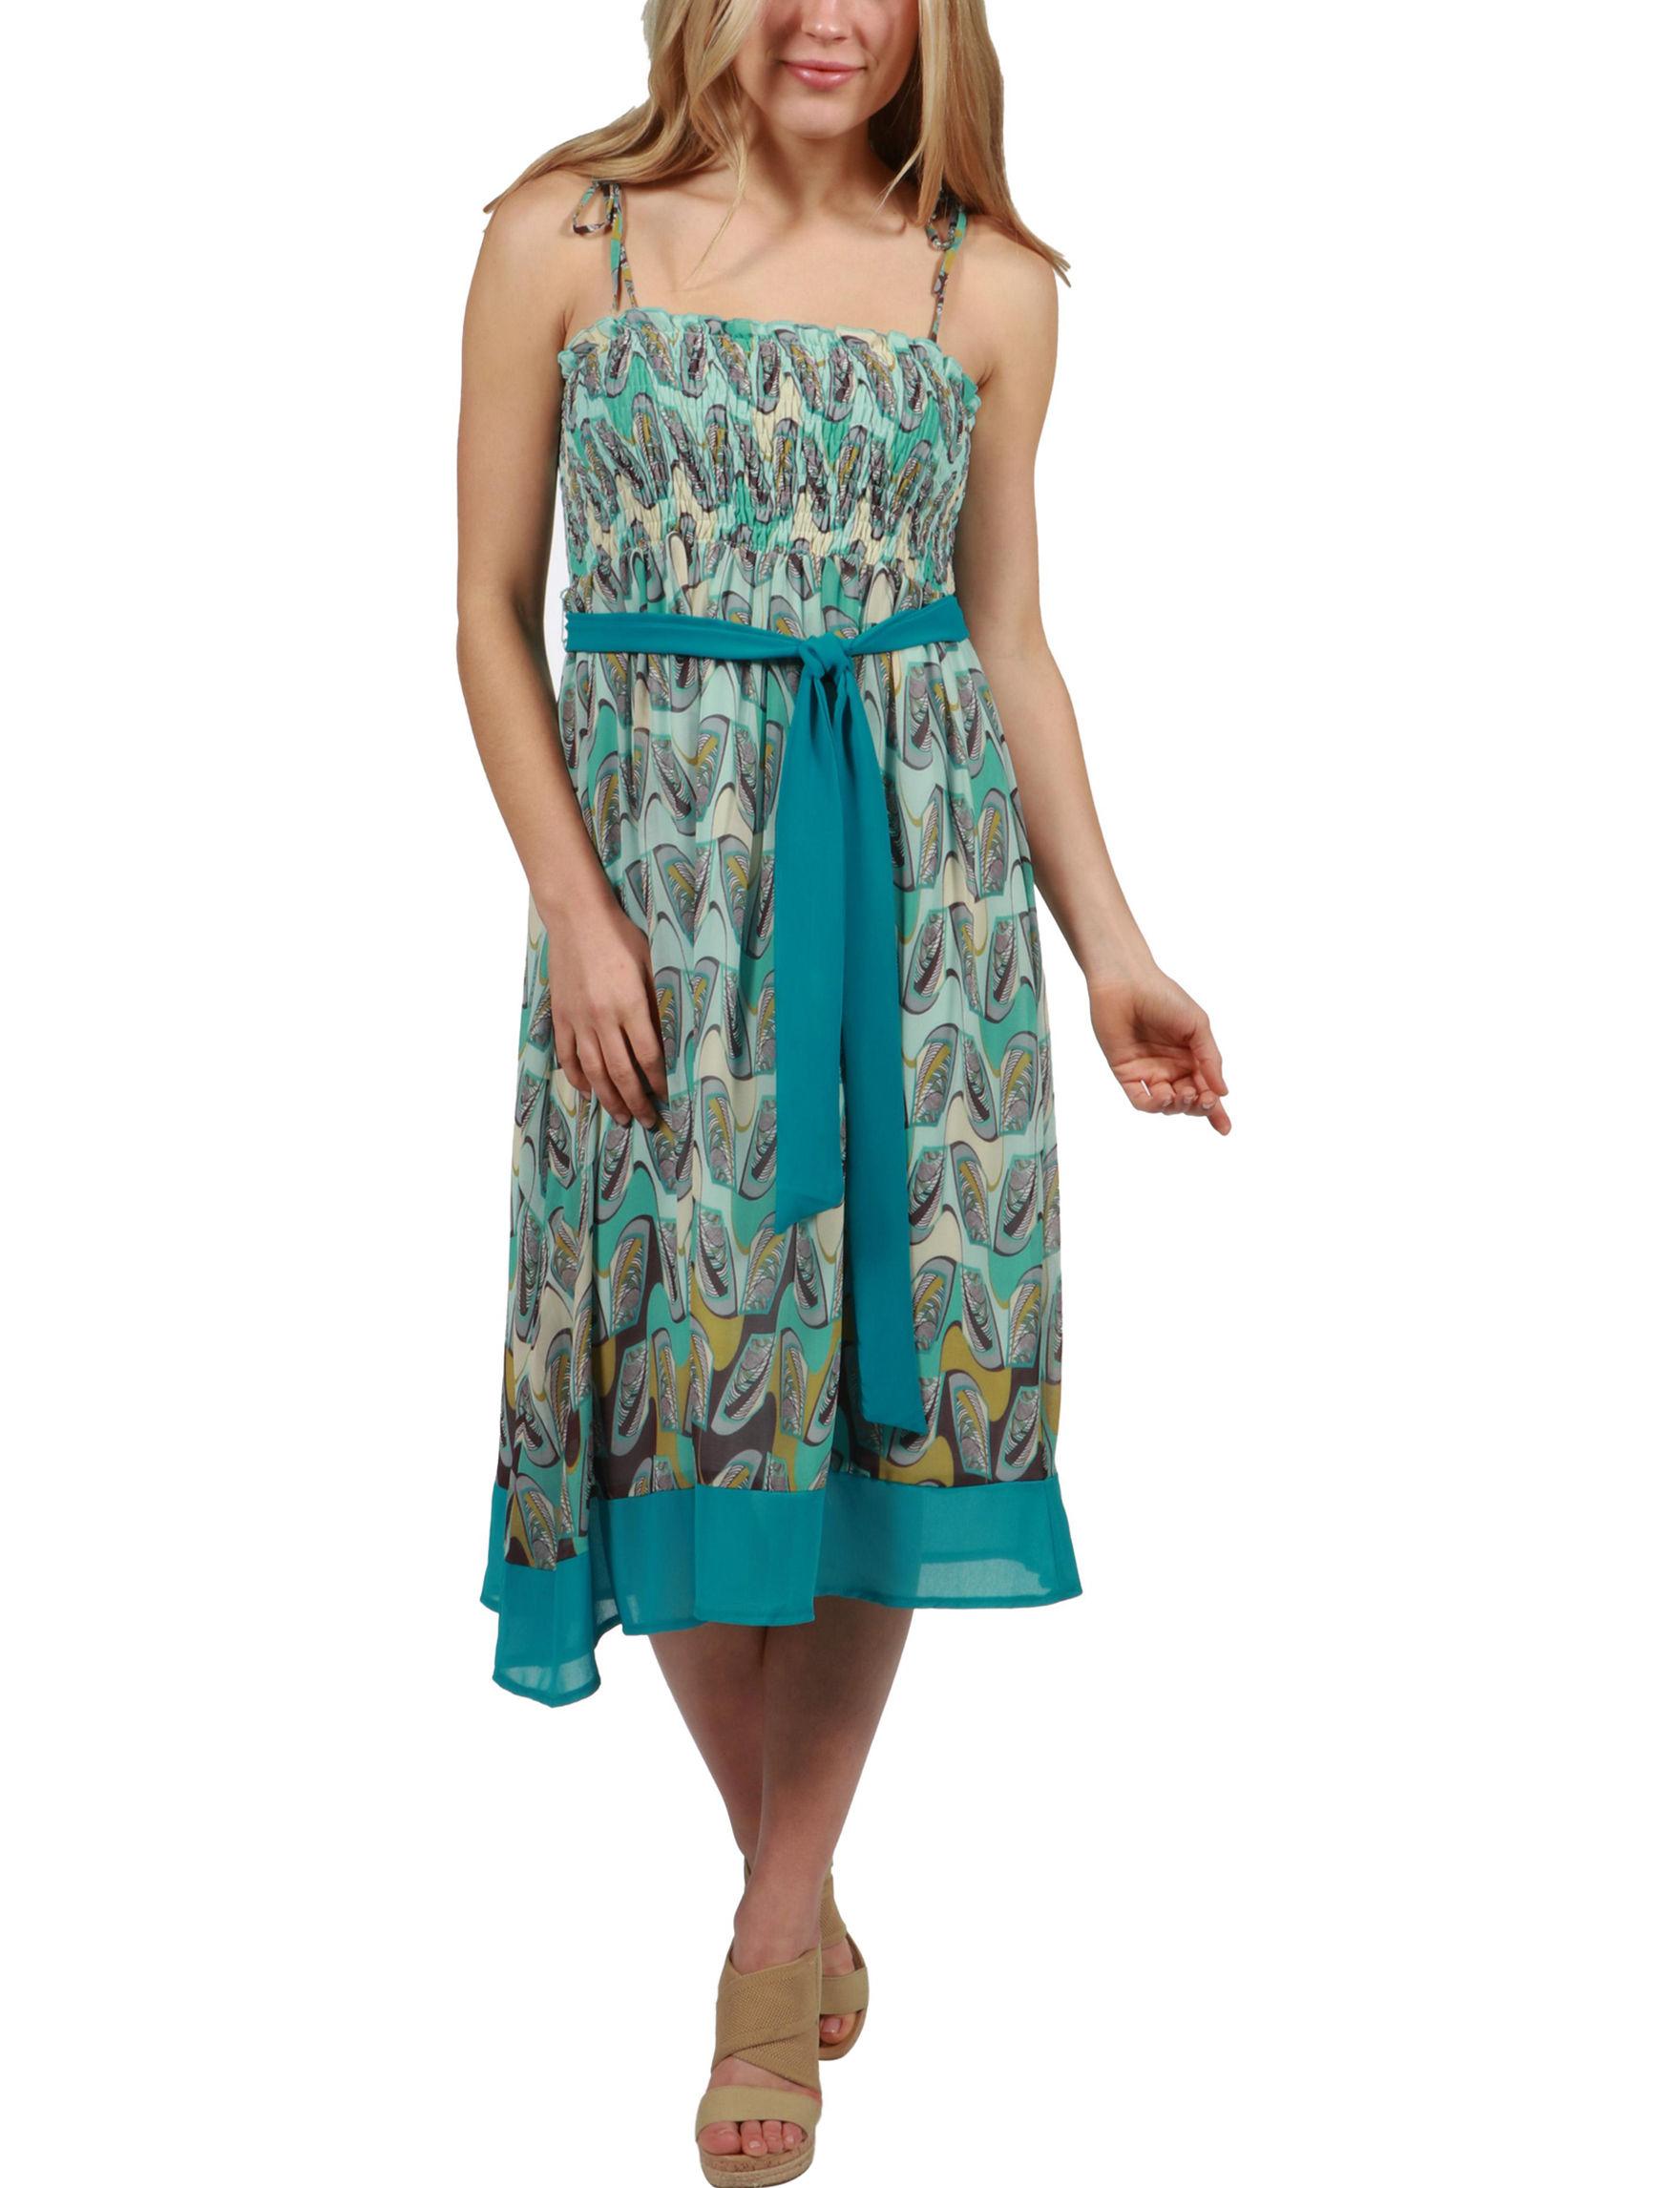 24Seven Comfort Apparel Blue Multi Everyday & Casual A-line Dresses Sundresses